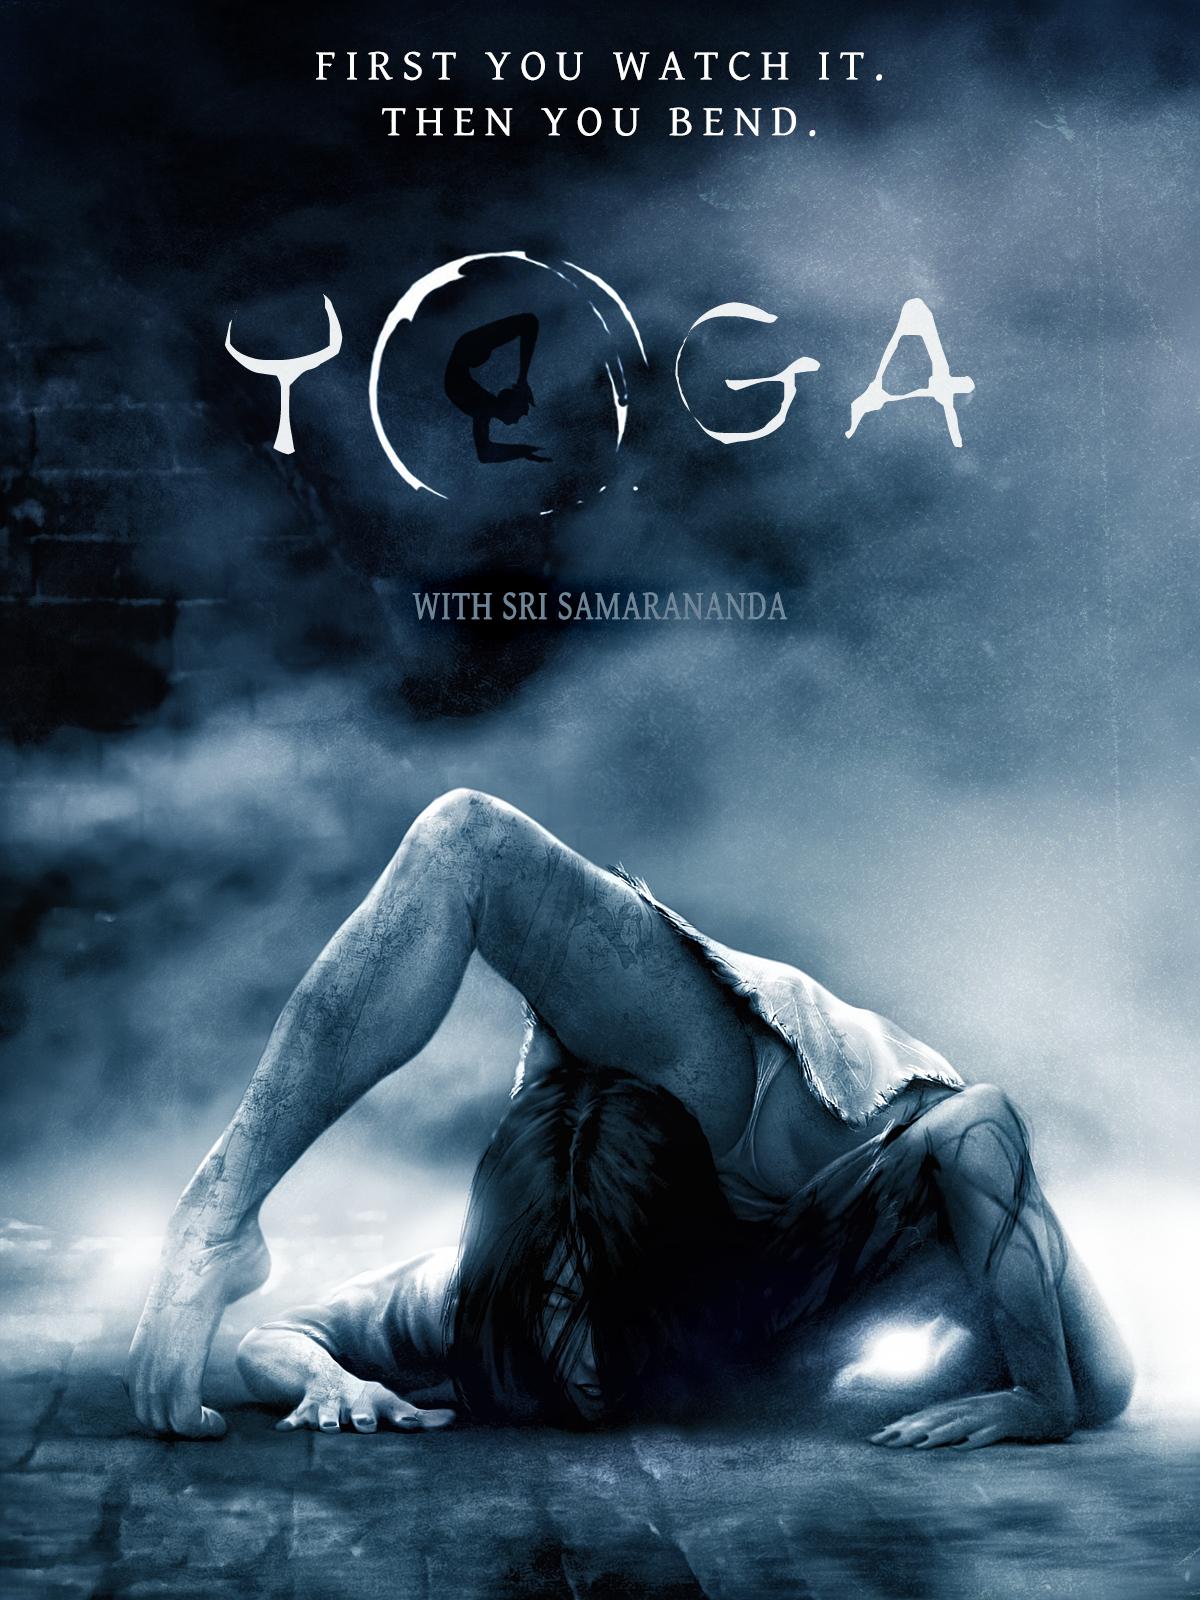 https://orig08.deviantart.net/c6f9/f/2017/173/3/d/samara_s_yoga_tape_by_yuni-dbdmi3g.jpg